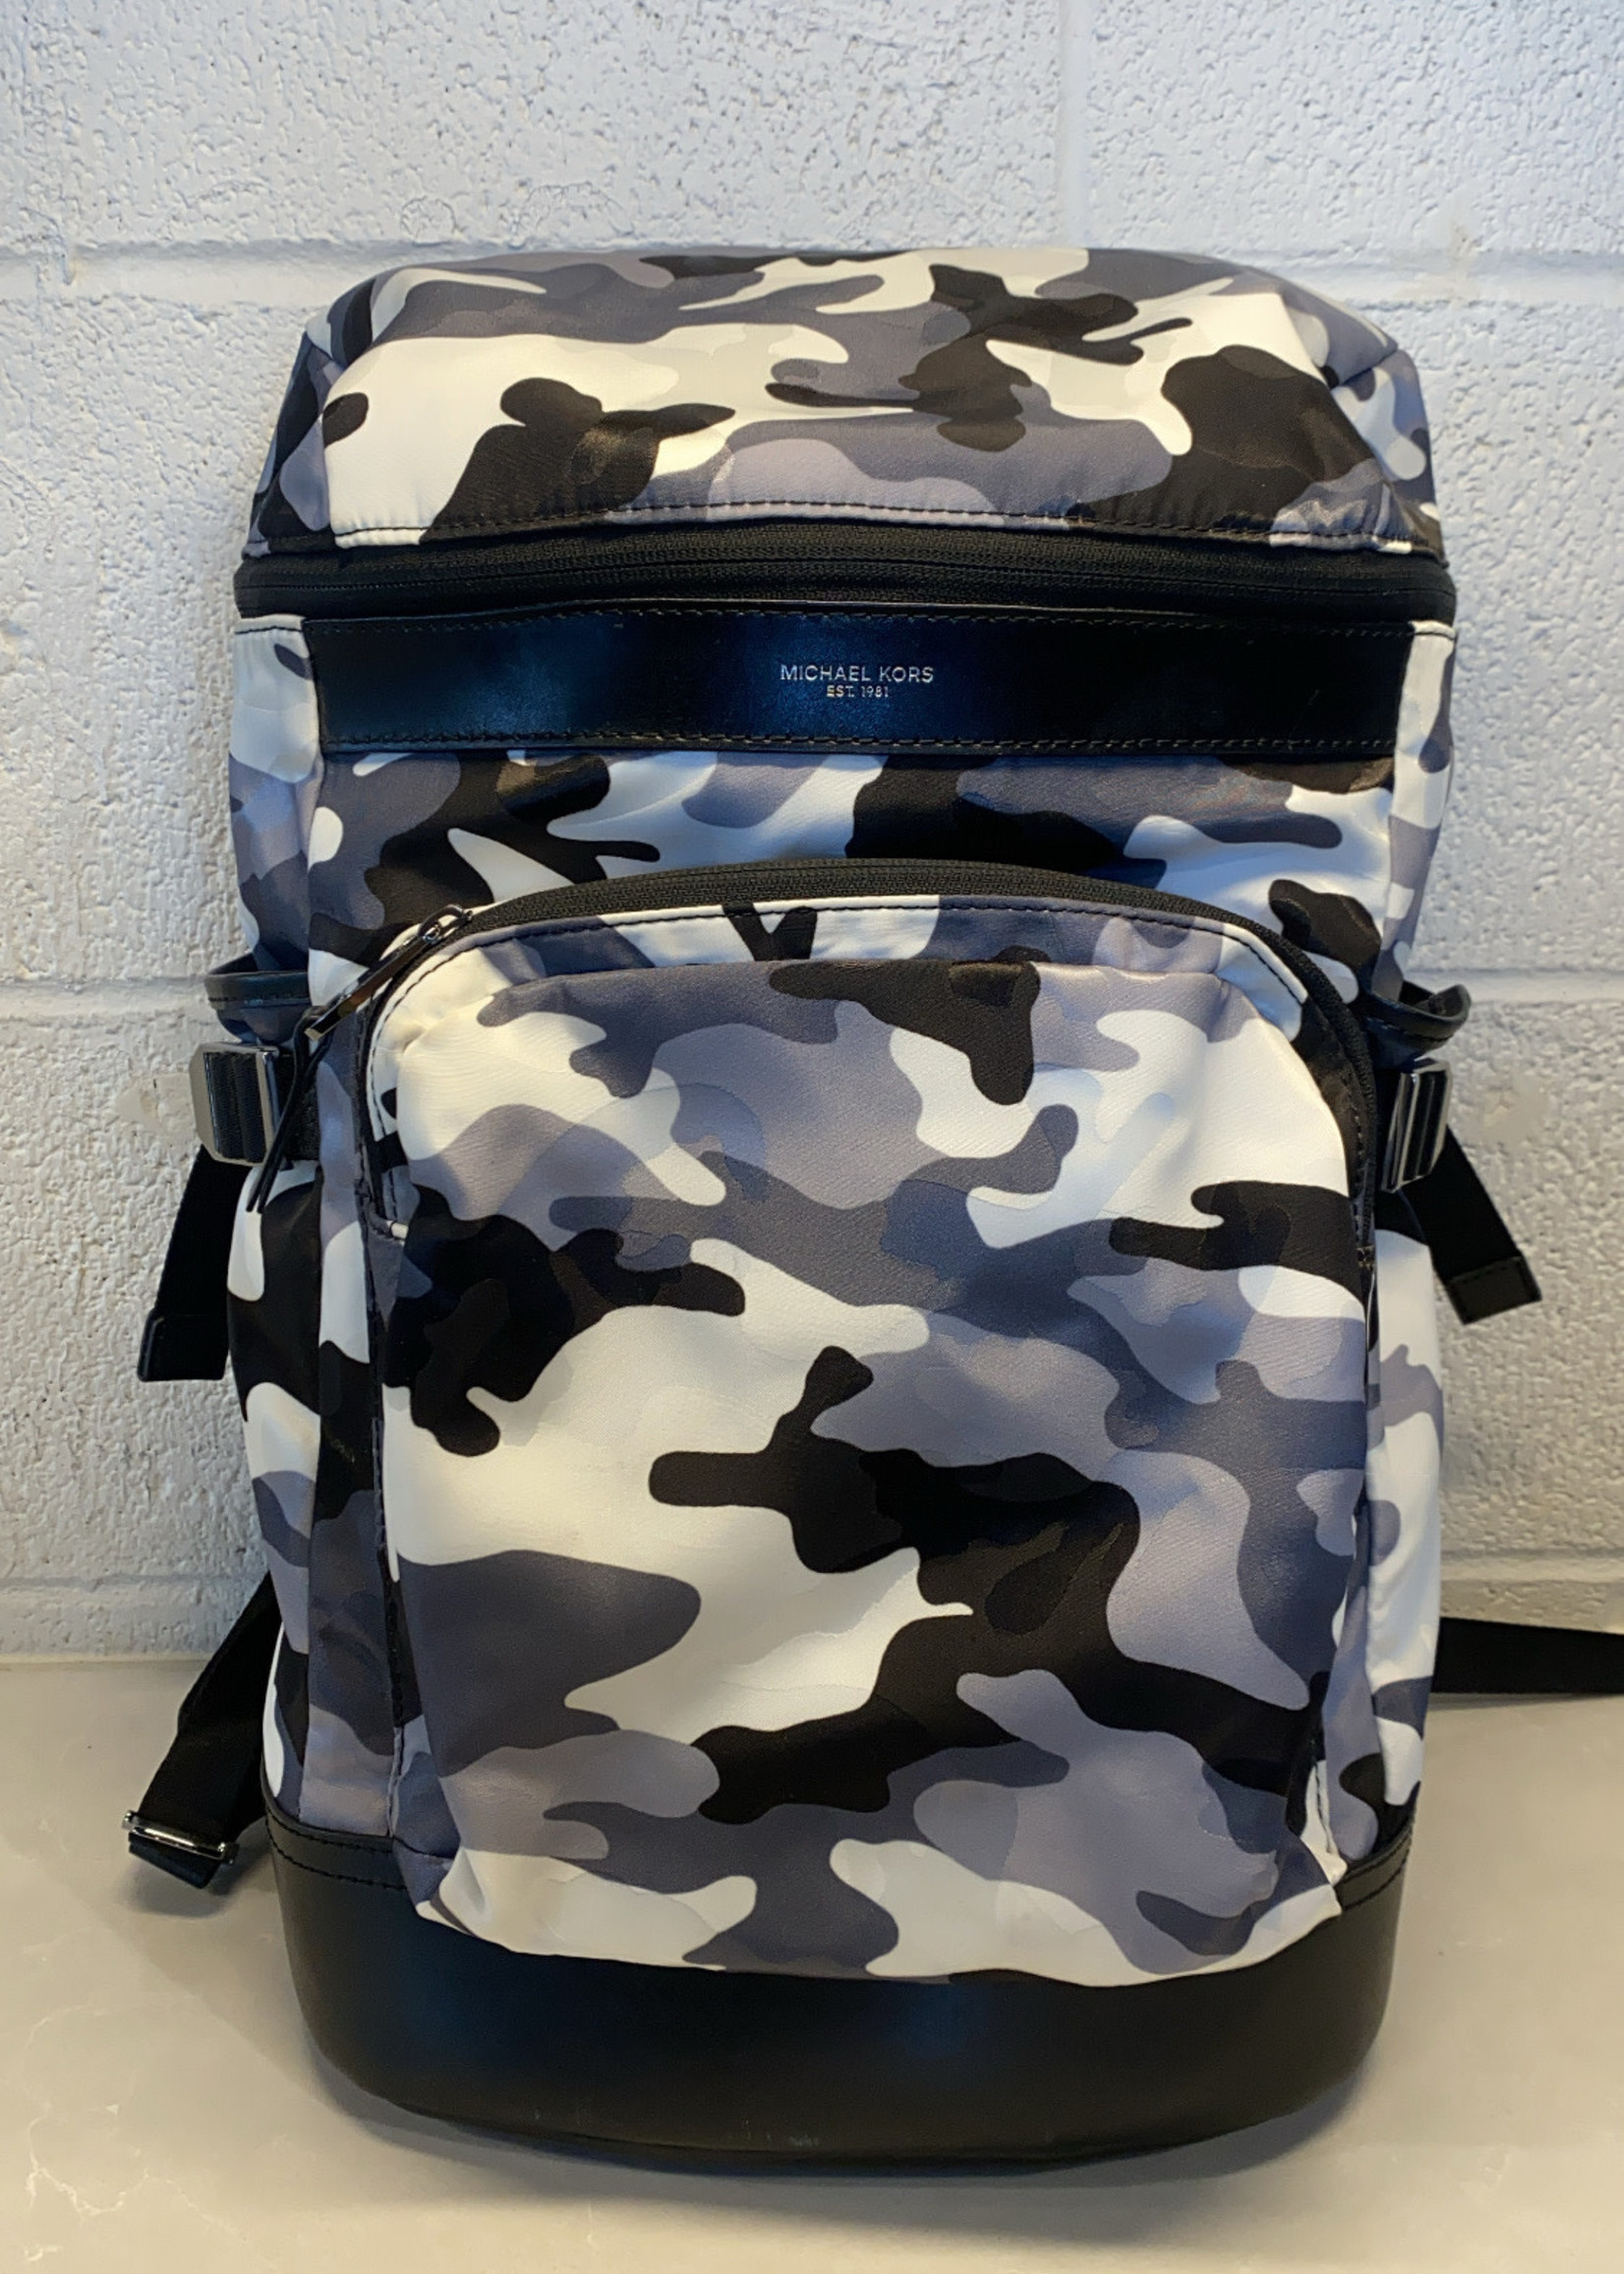 Michael Kors black and white camo print backpack (Retail: $200+)